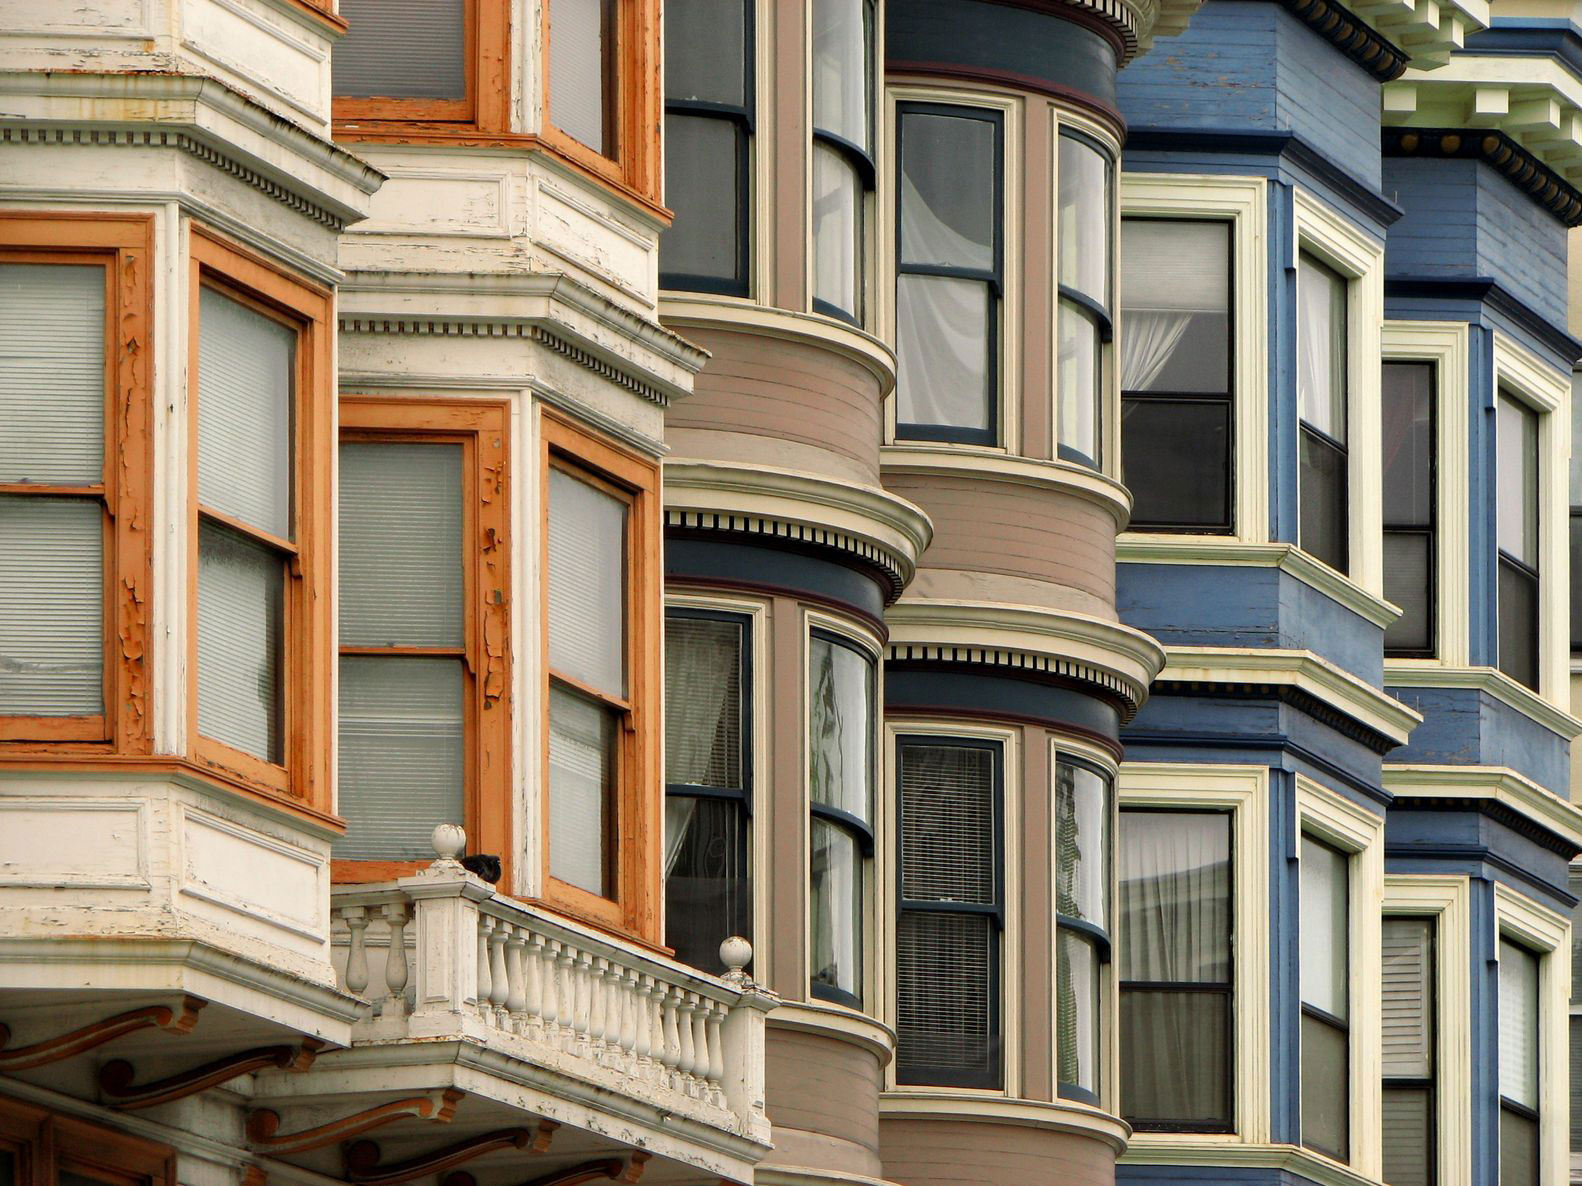 older windows in need of repair or replacement